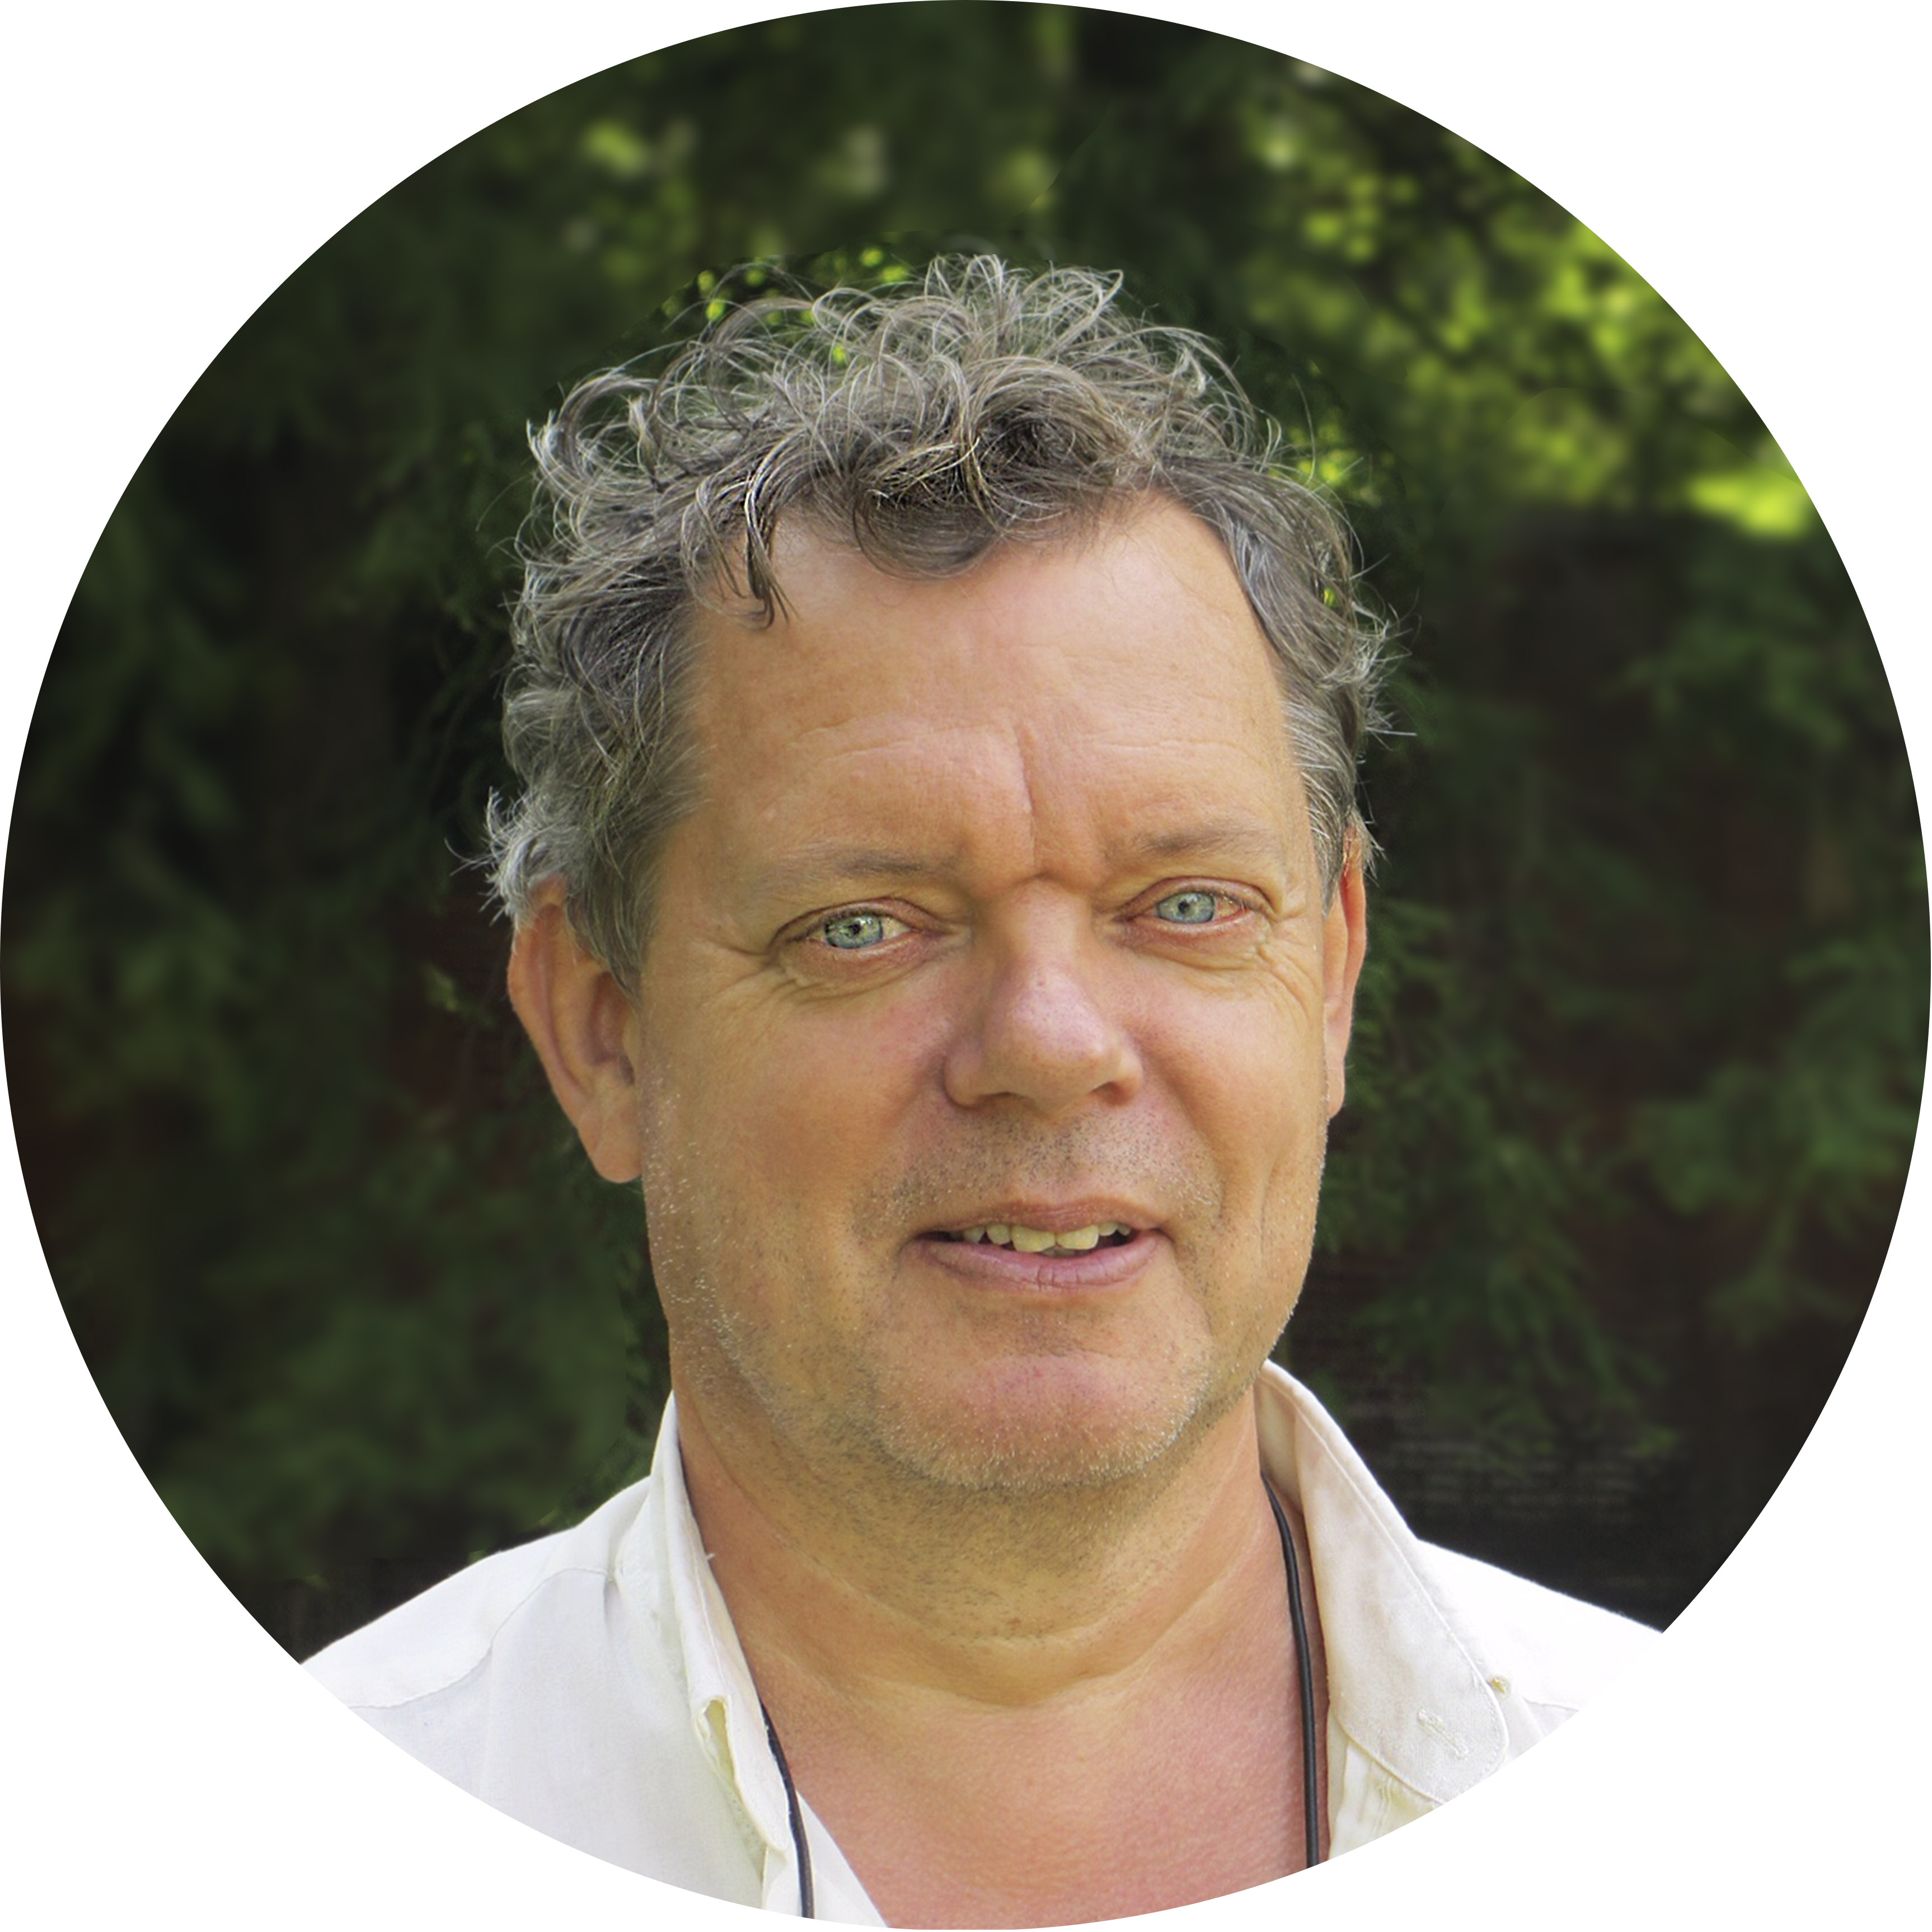 Fred van der Burgh